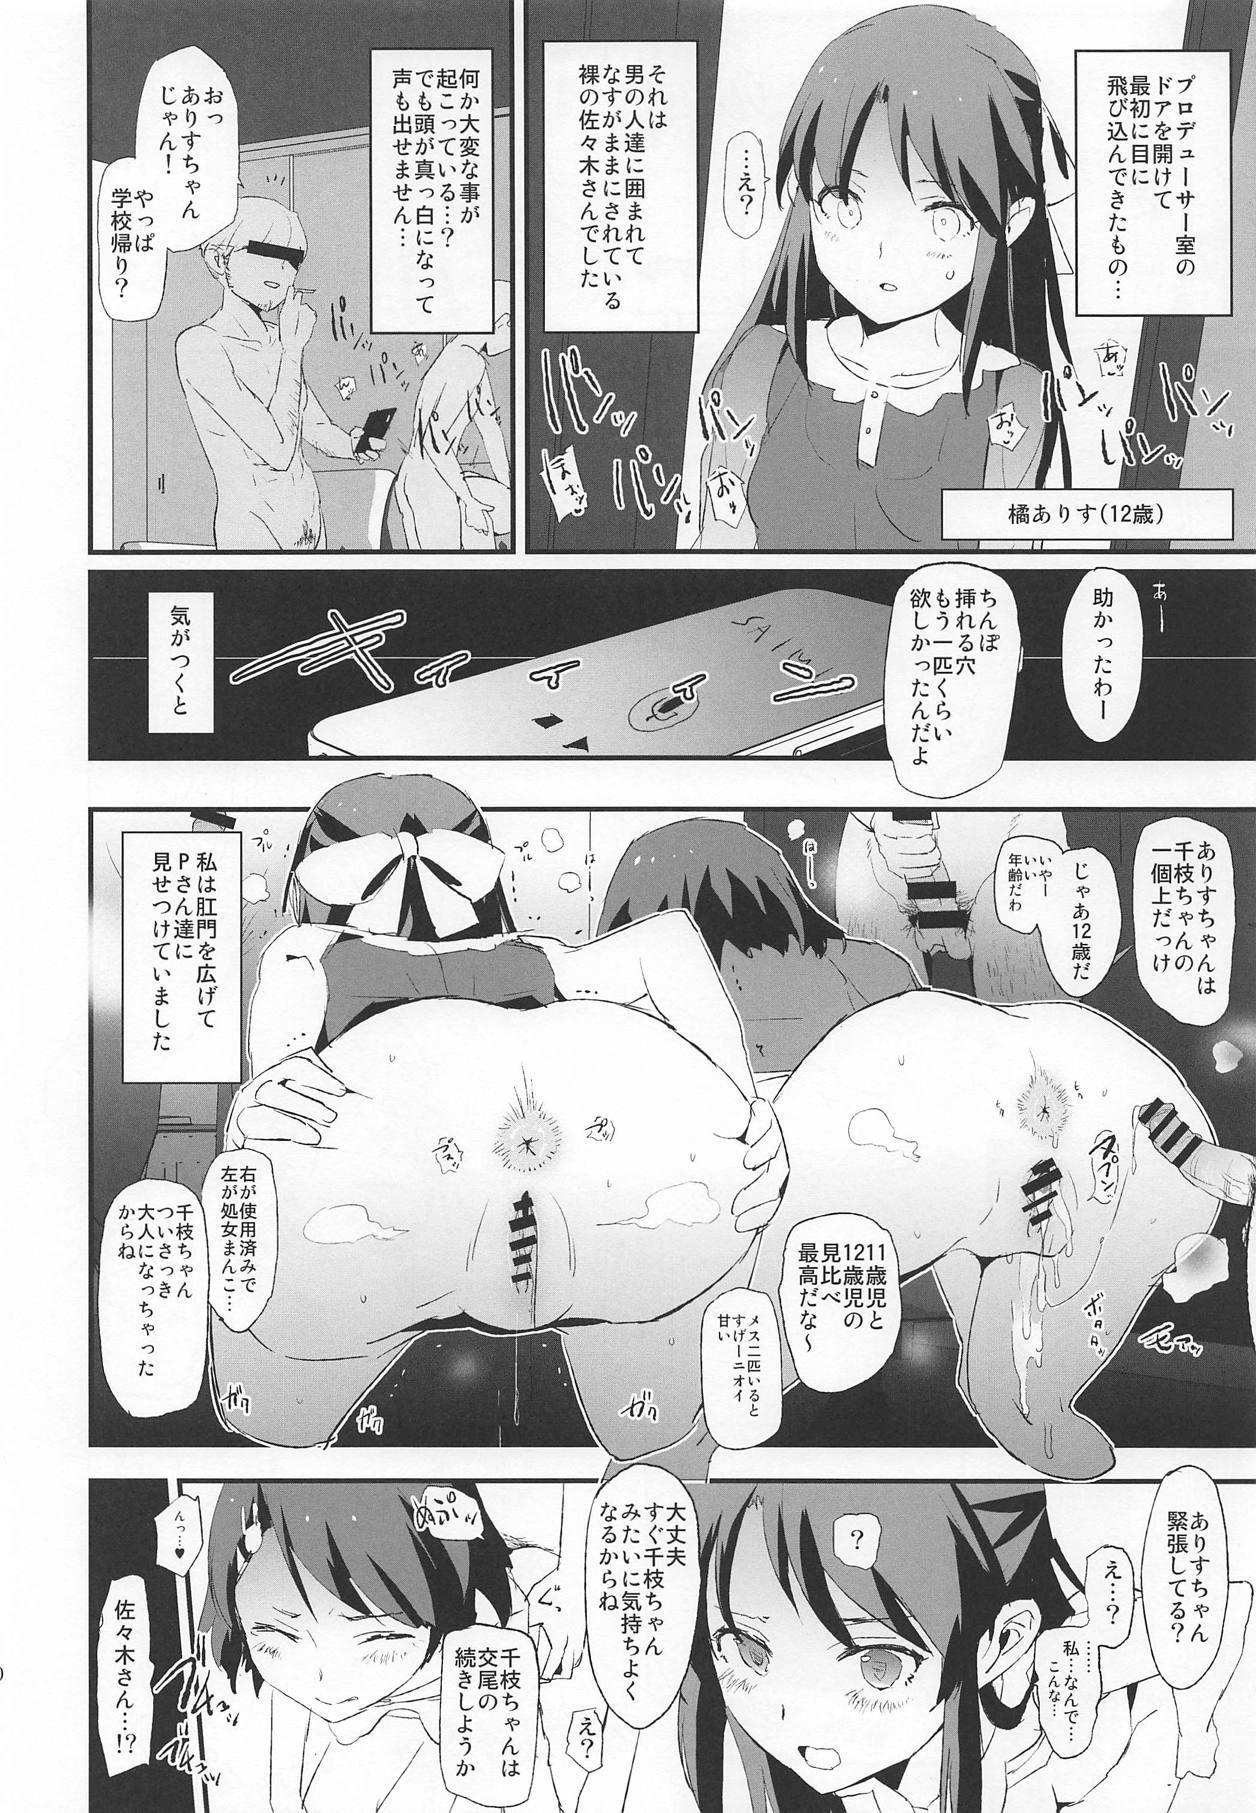 Sasaki Chie to Saimin Dosukebe Higaisha no Kai 8